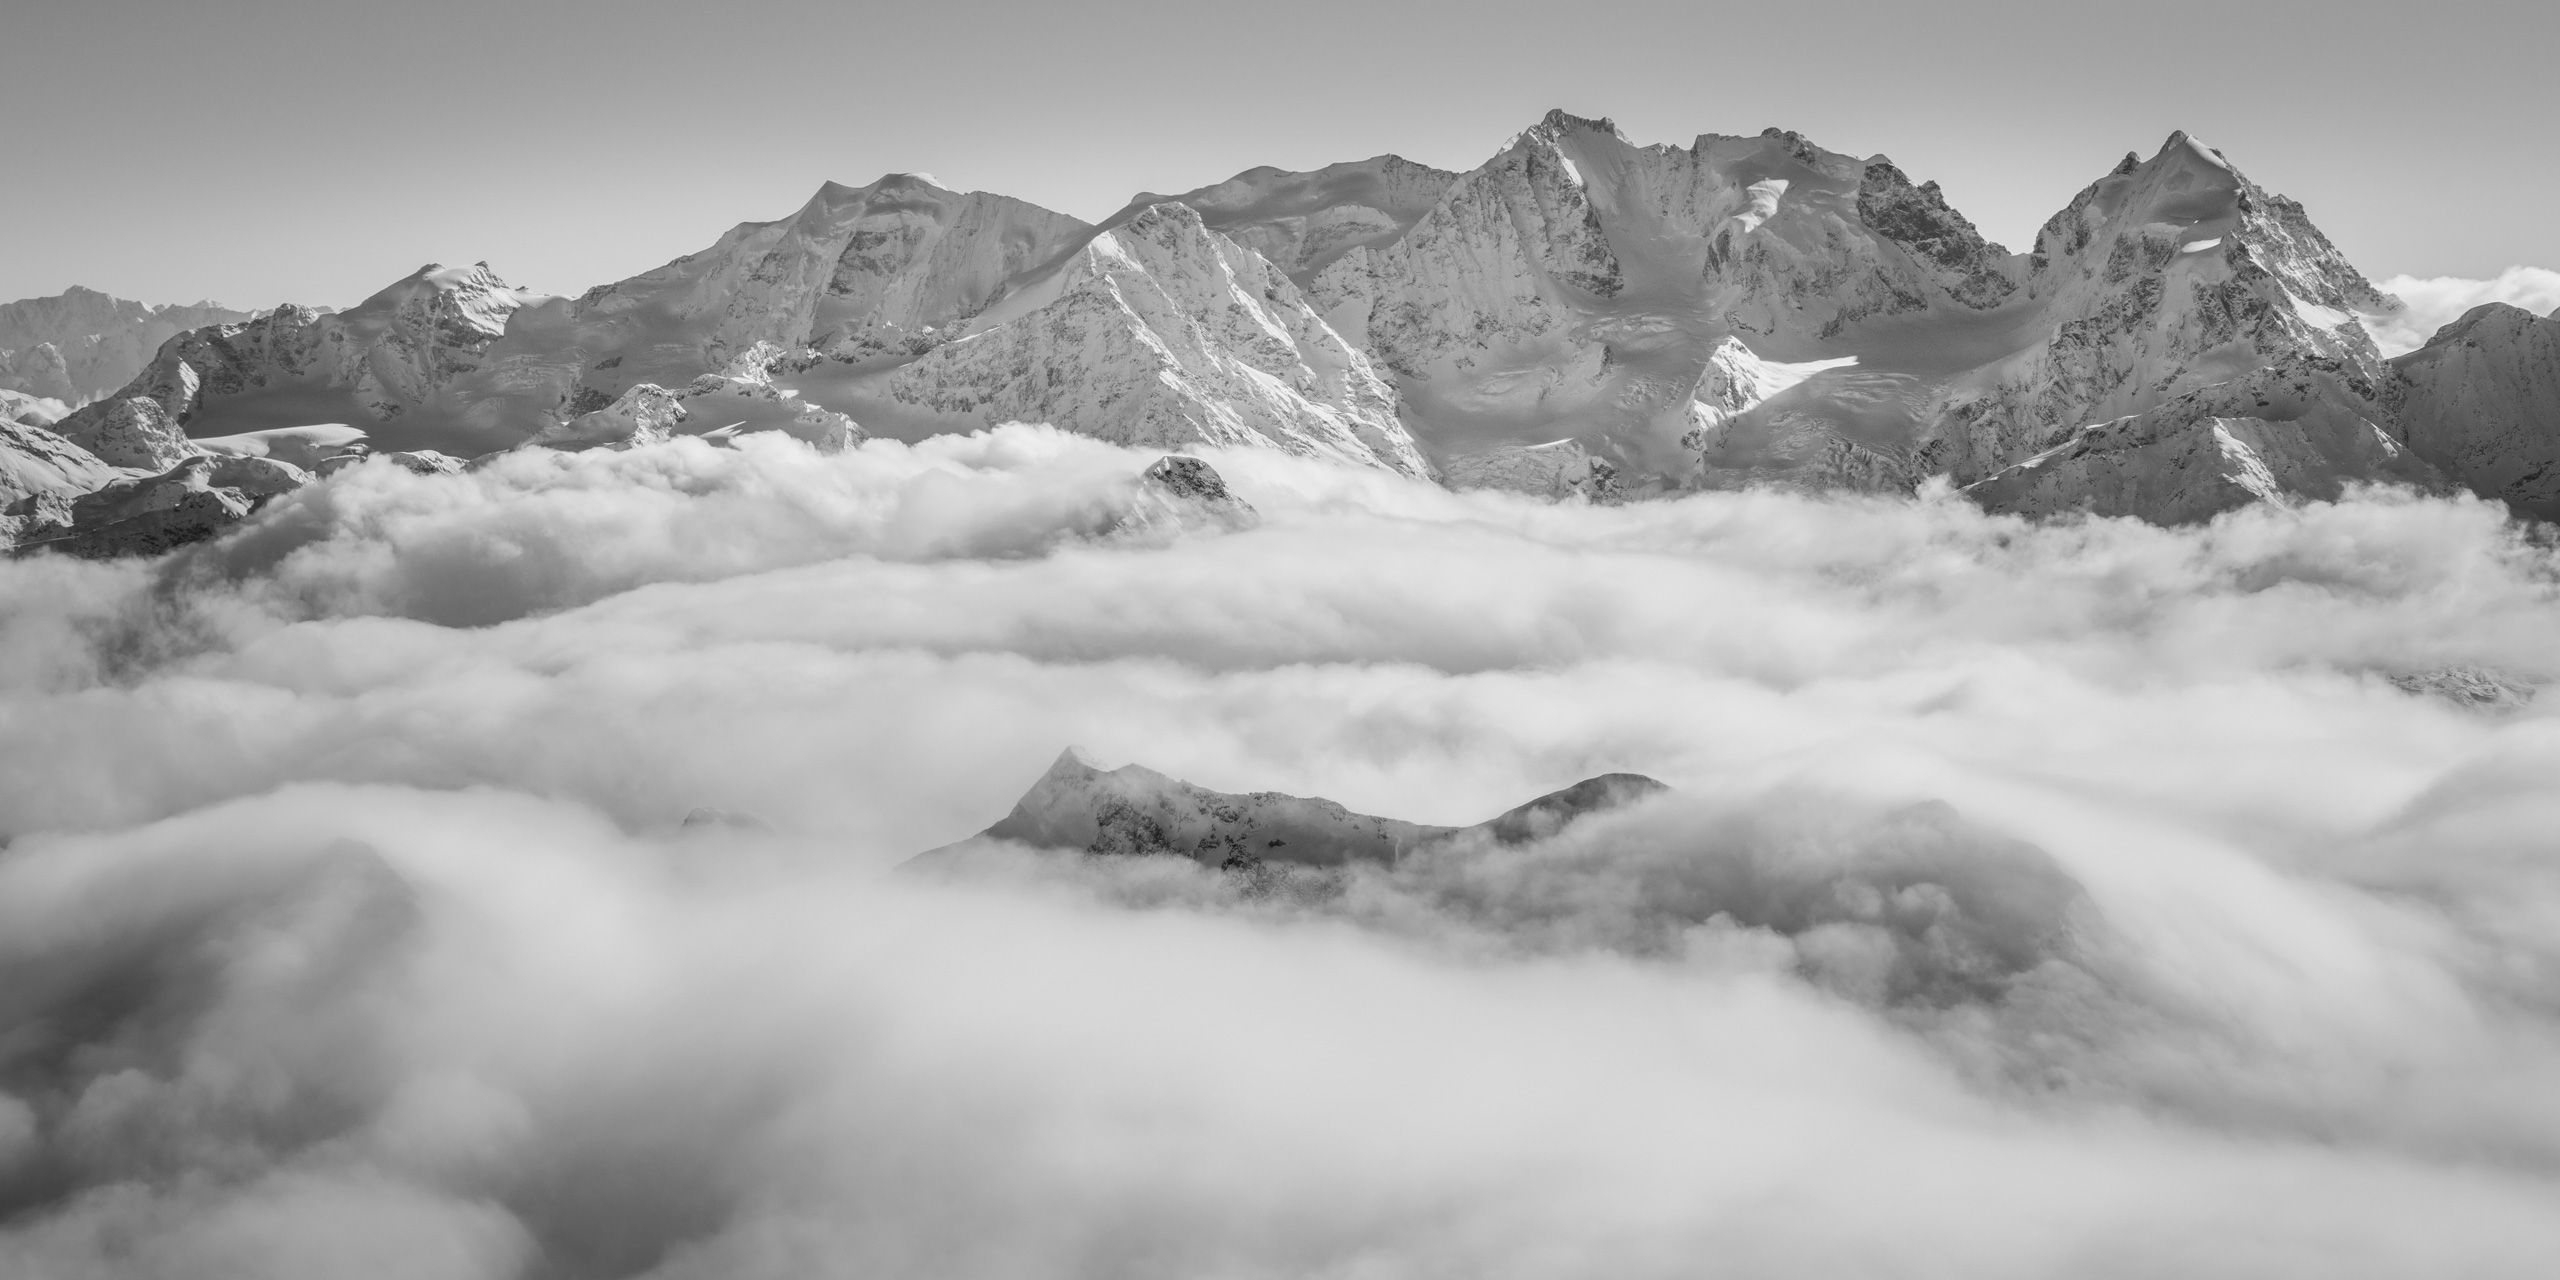 Panorama du massif de la Bernina - Vue sur le Piz Palu, Piz Bernina et Piz Roseg